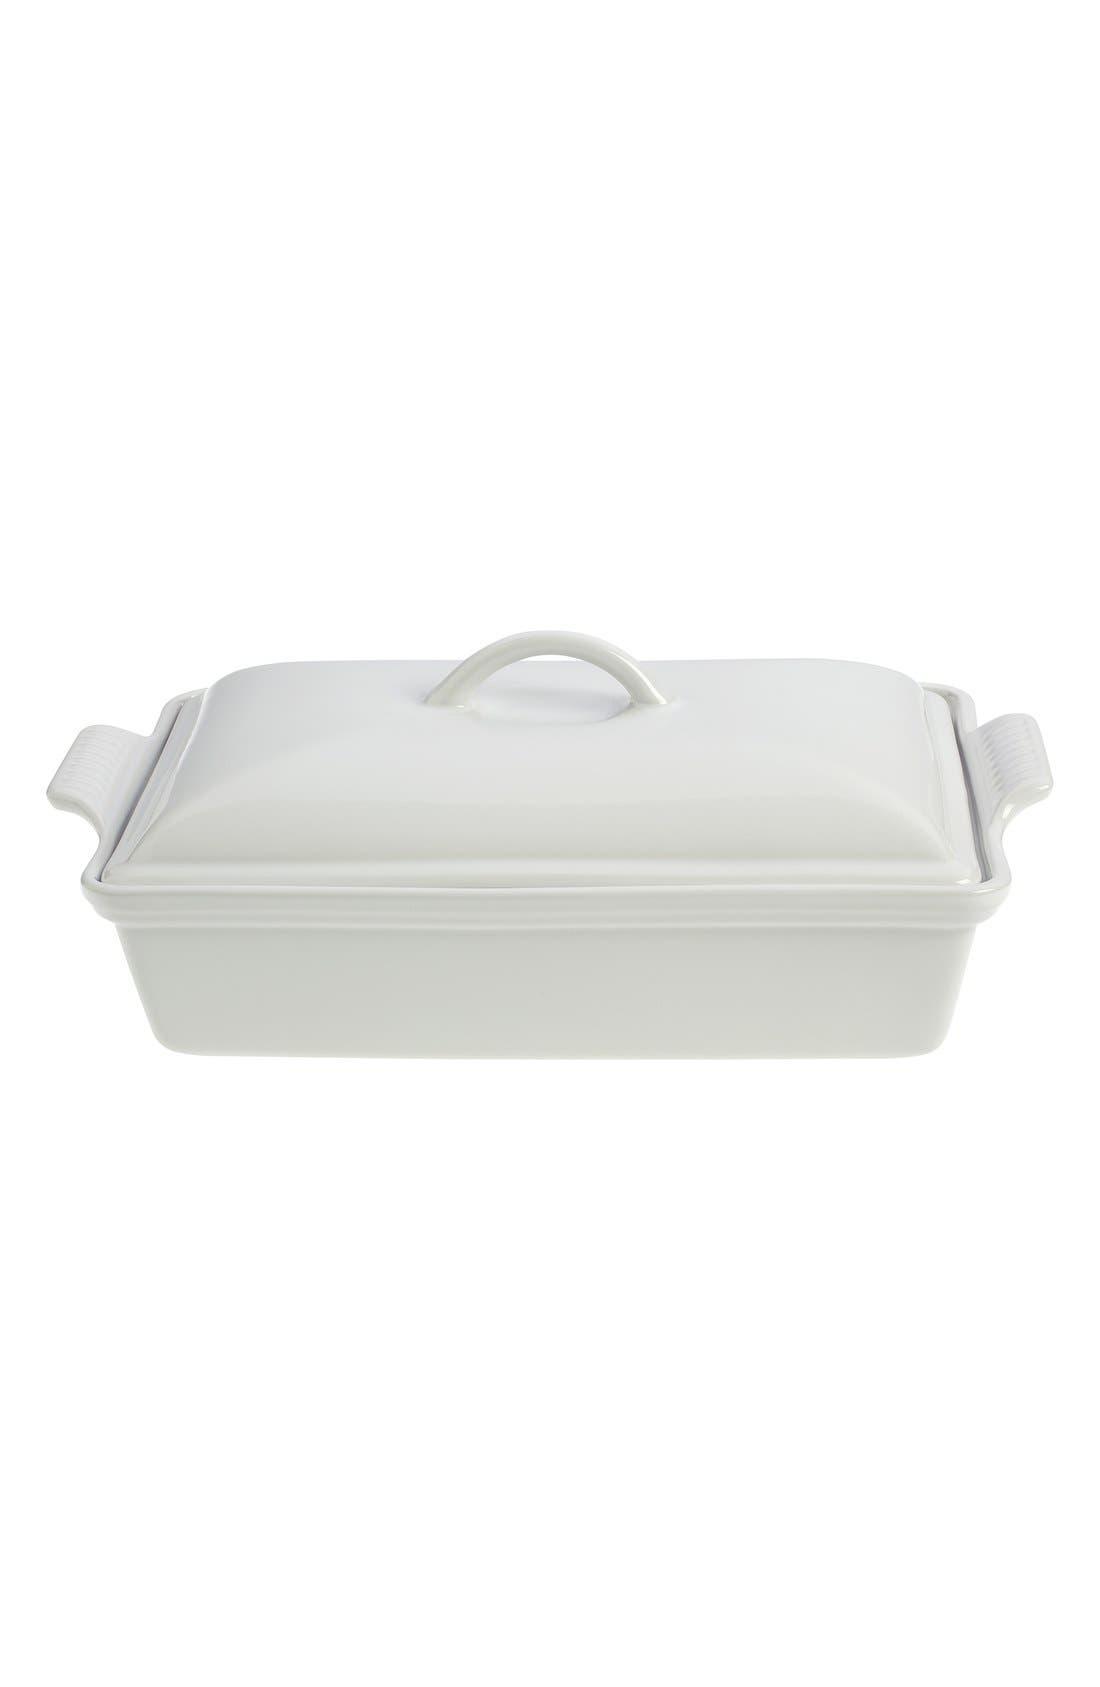 4 Quart Covered Rectangular Stoneware Casserole,                         Main,                         color, White